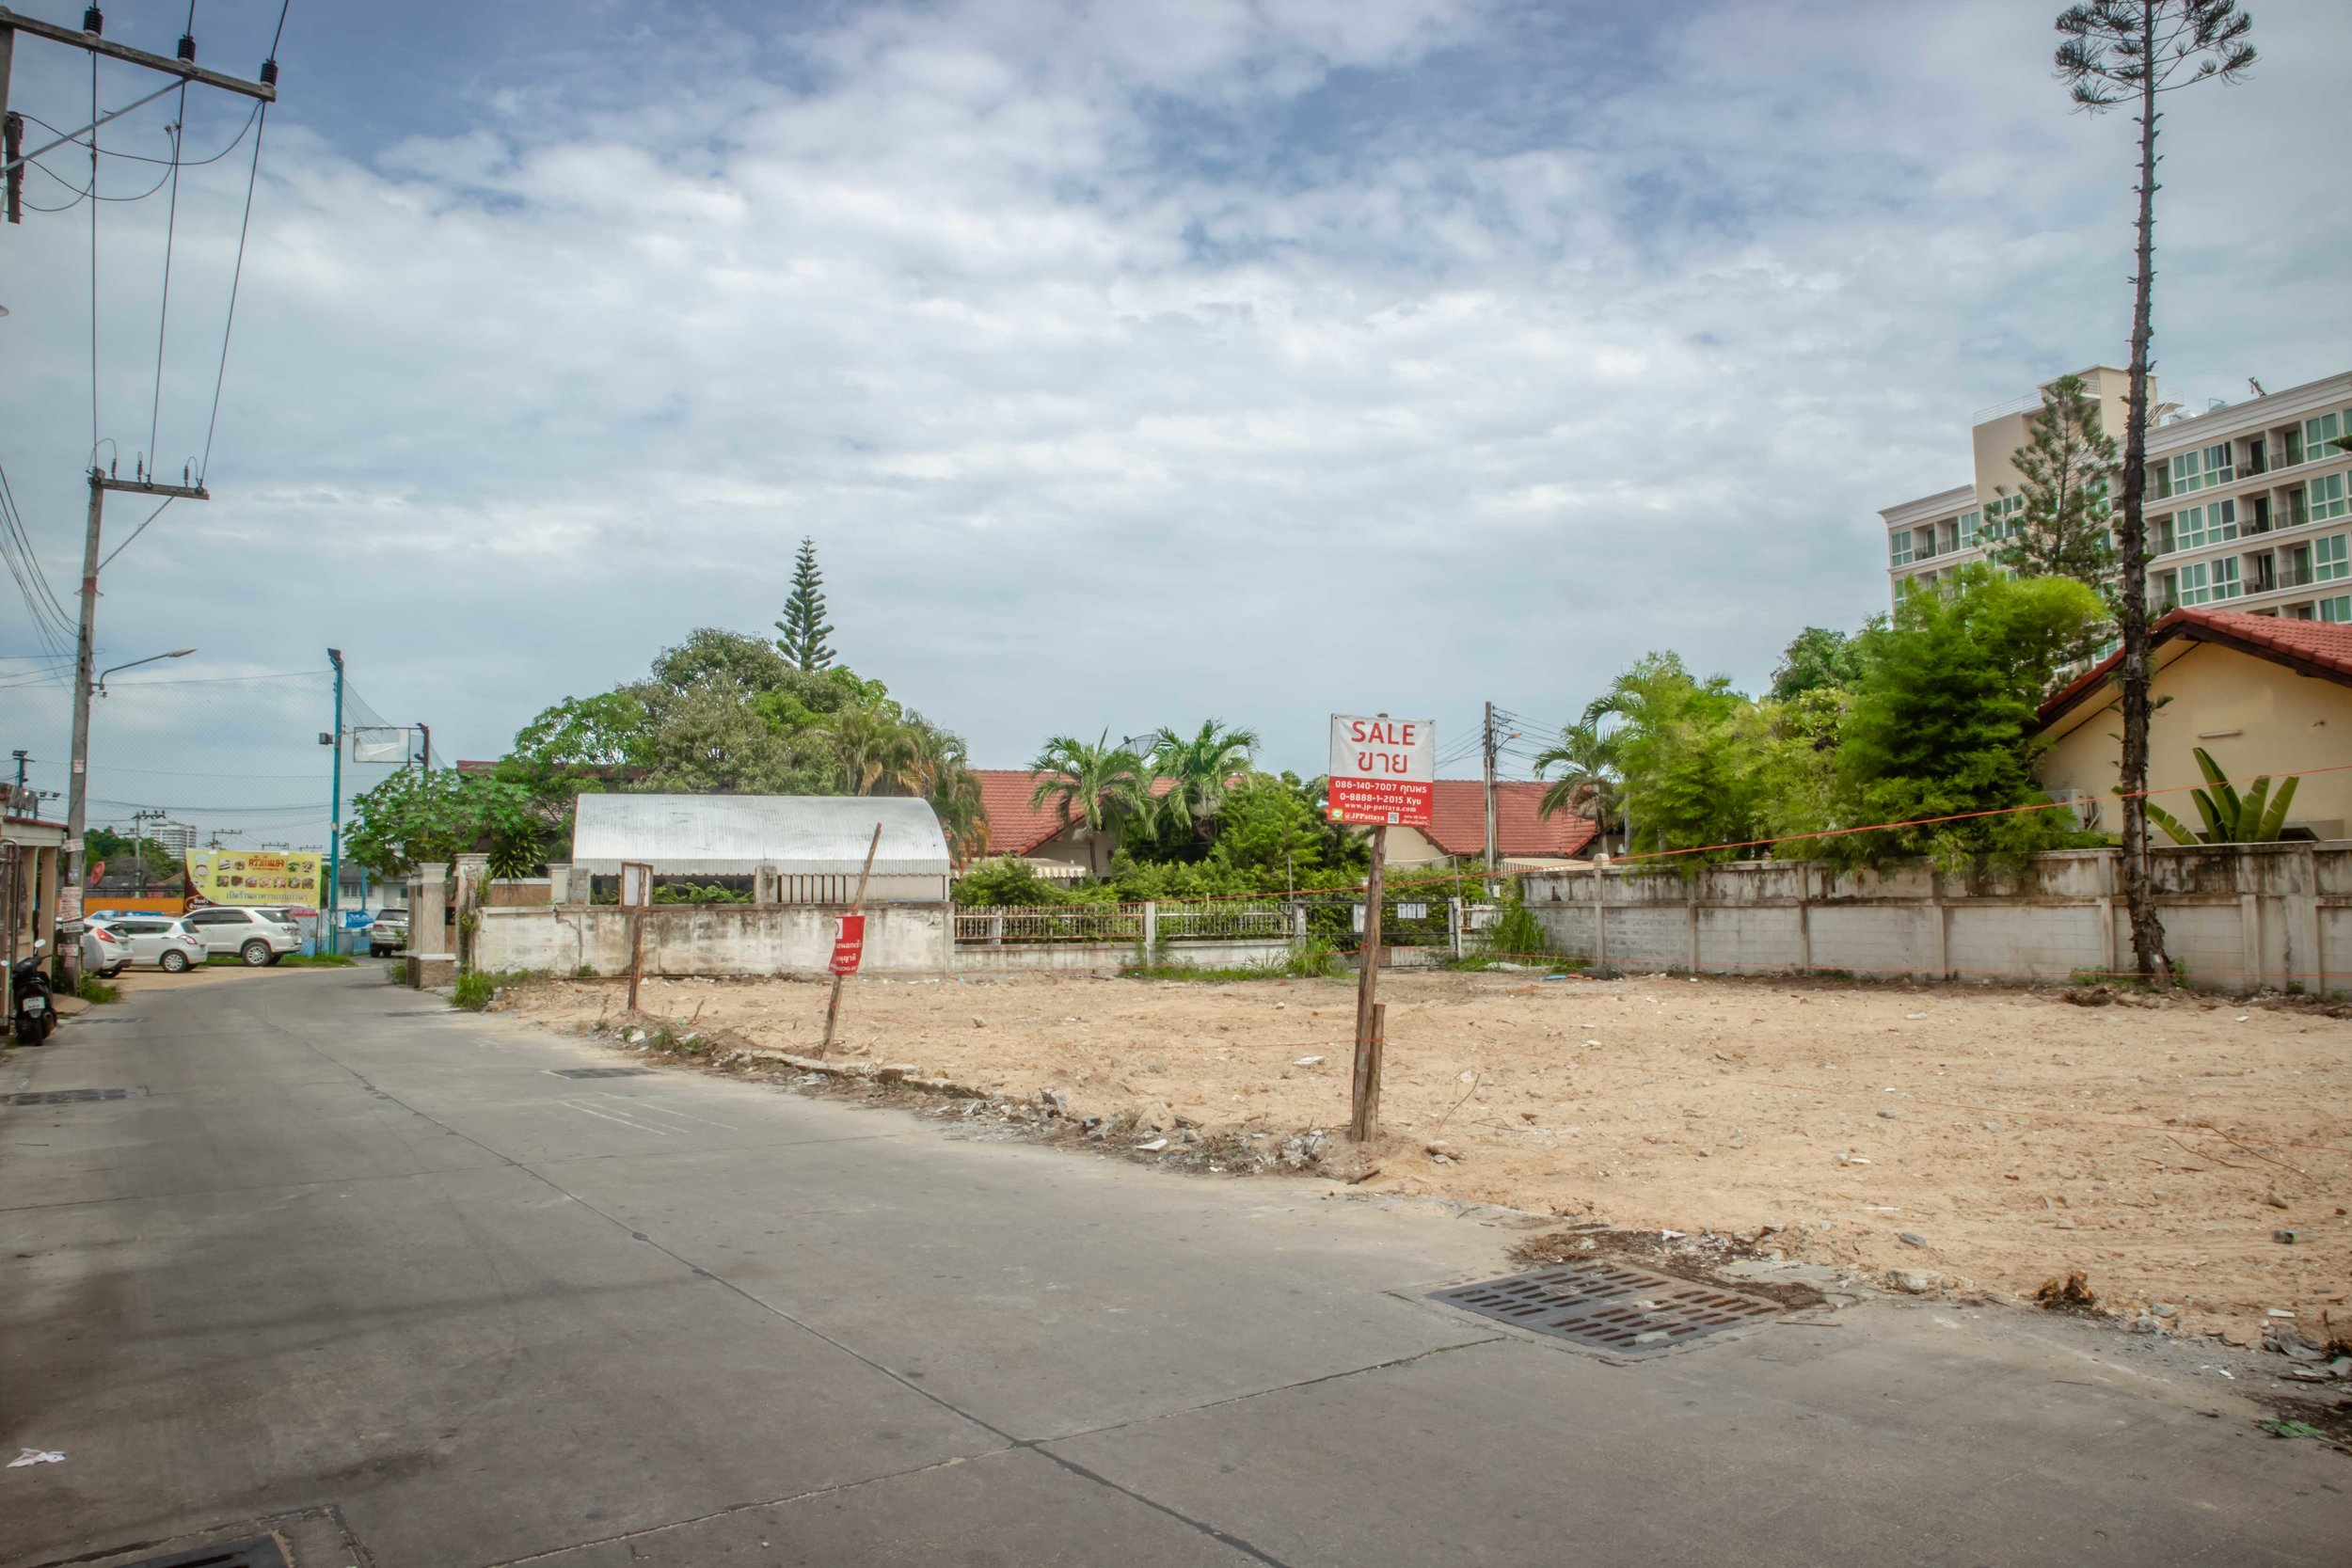 Land for sale - 9 Million Baht 128 Sq.wa., 512 Sq.m.